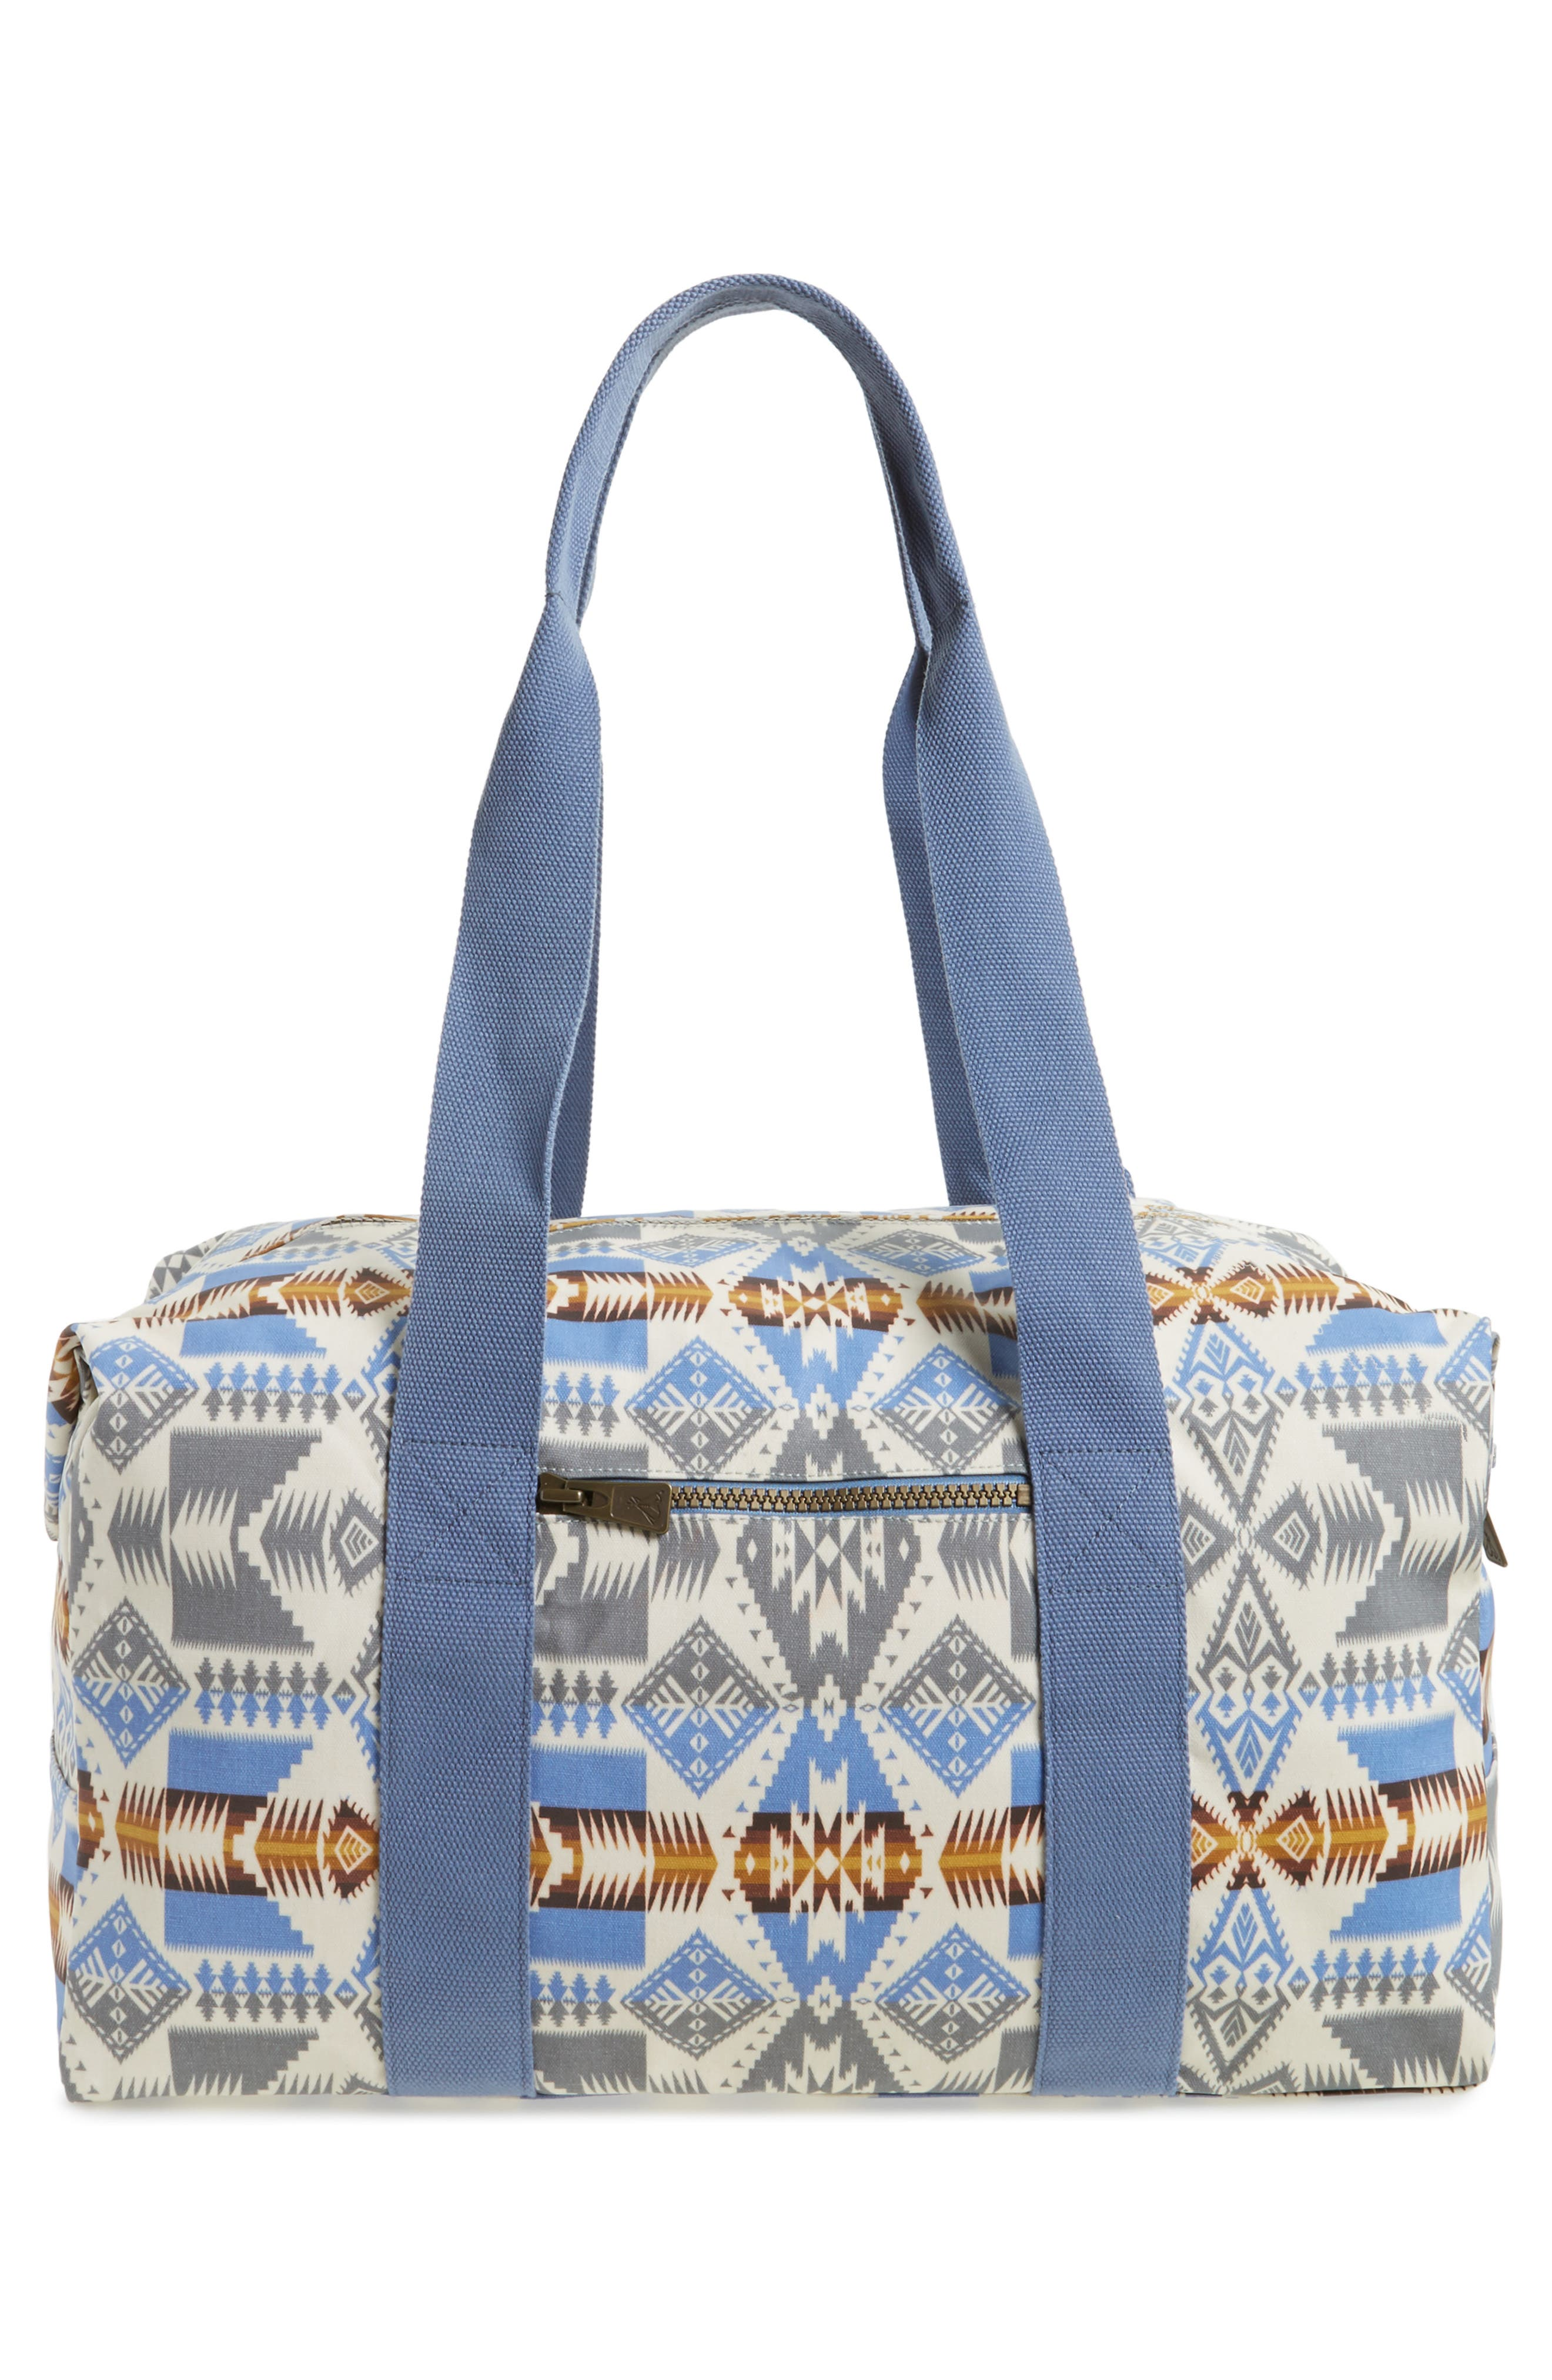 Canopy Duffel Bag,                             Alternate thumbnail 3, color,                             040